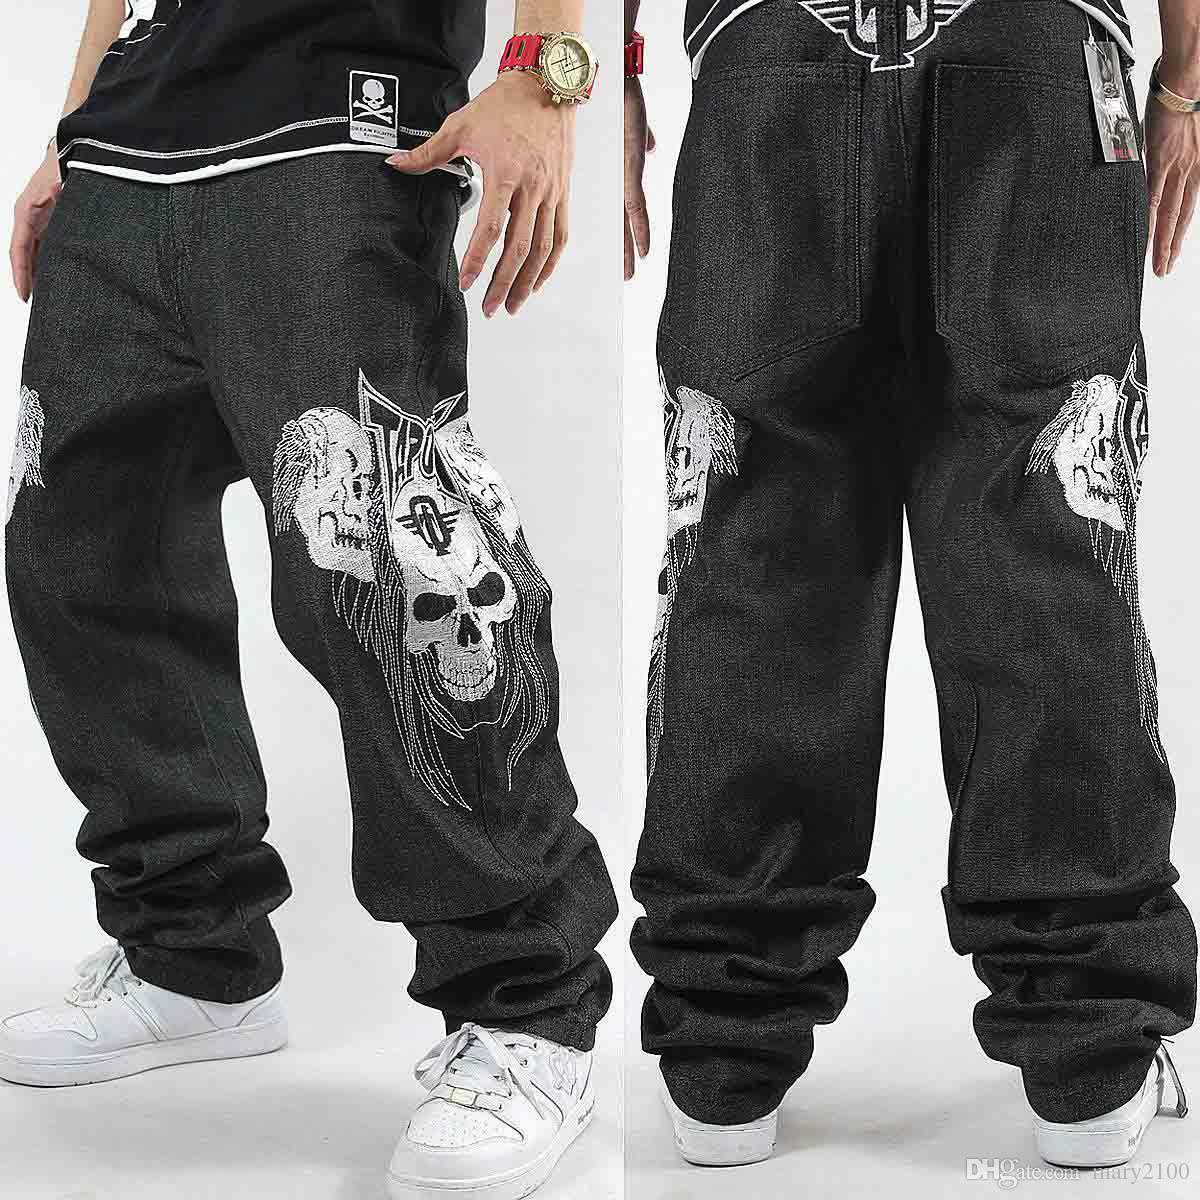 HIPHOP Street dance jeans marea hombres bordado cráneo Street jeans de la motocicleta Hip Hop Skateboard Jeans para hombres Definitivamente pantalones de baile disco